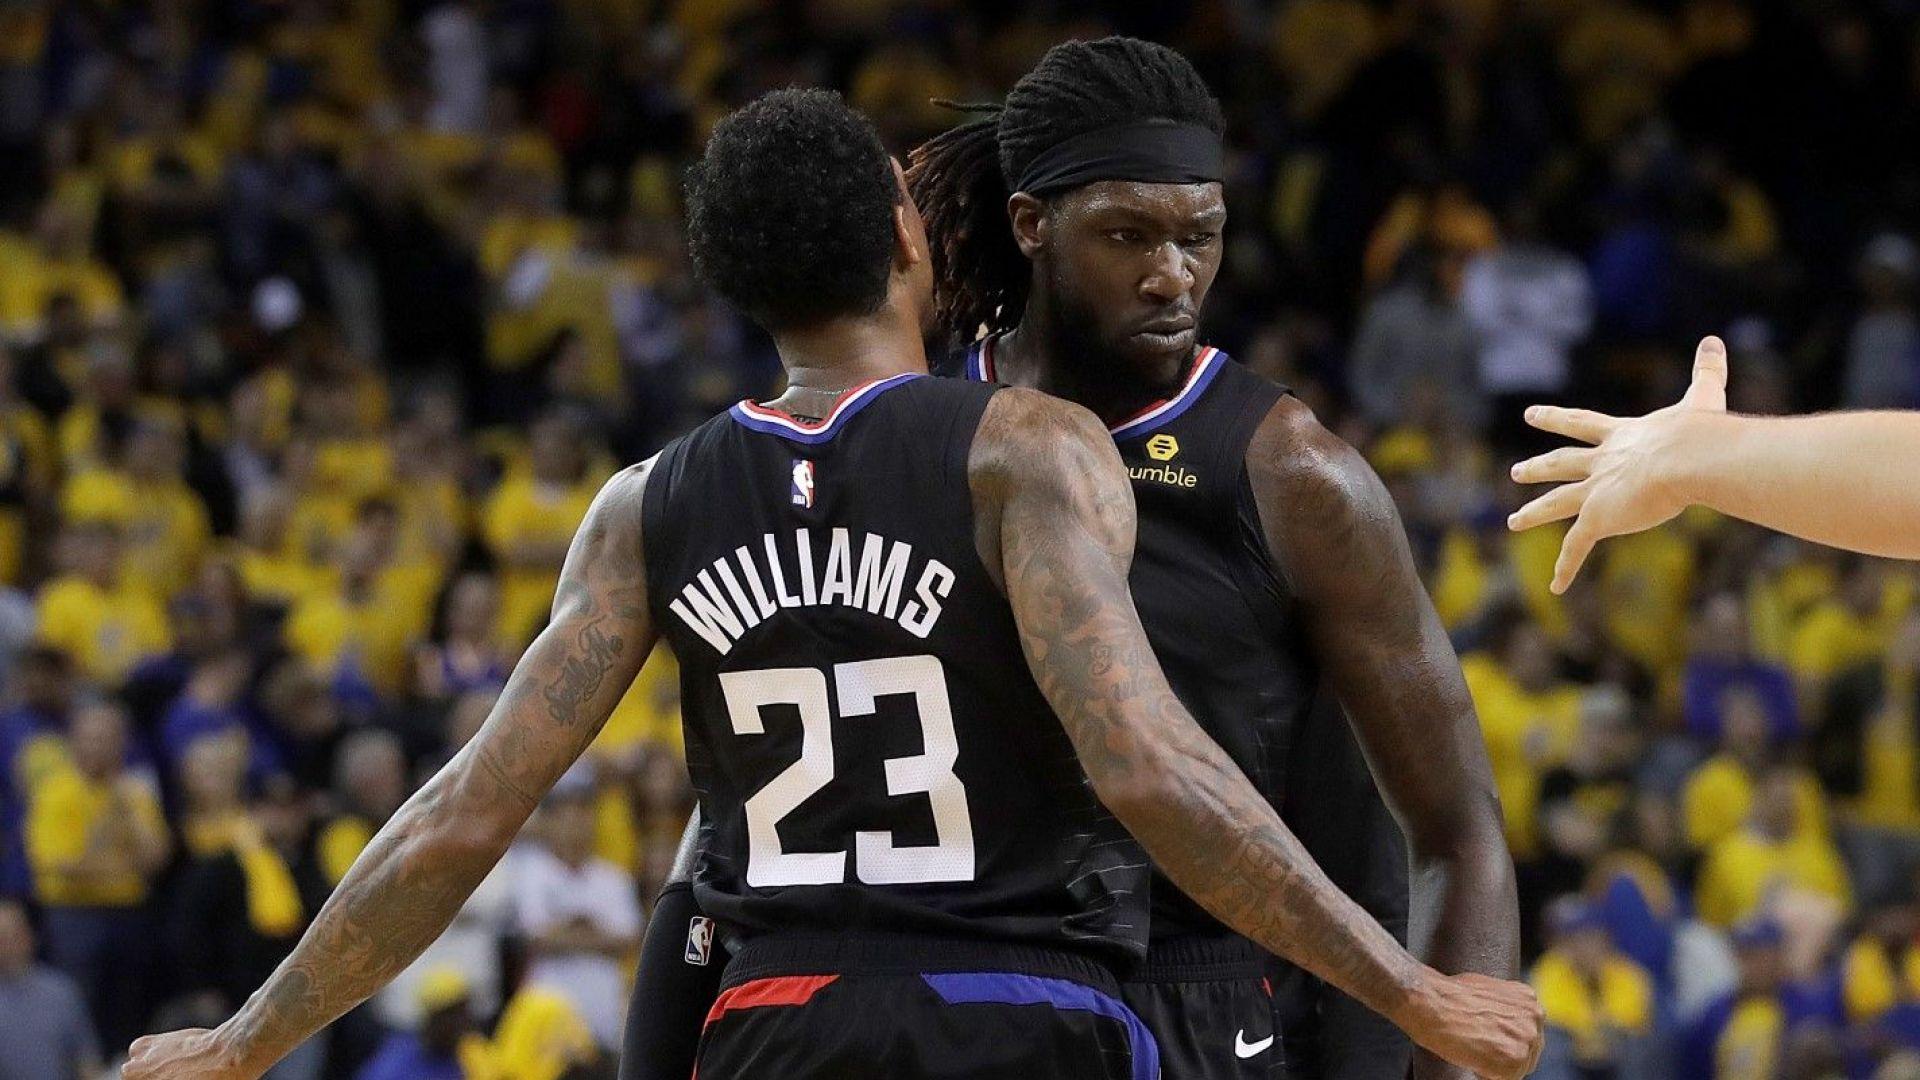 Немислим обрат шокира шампионите в НБА